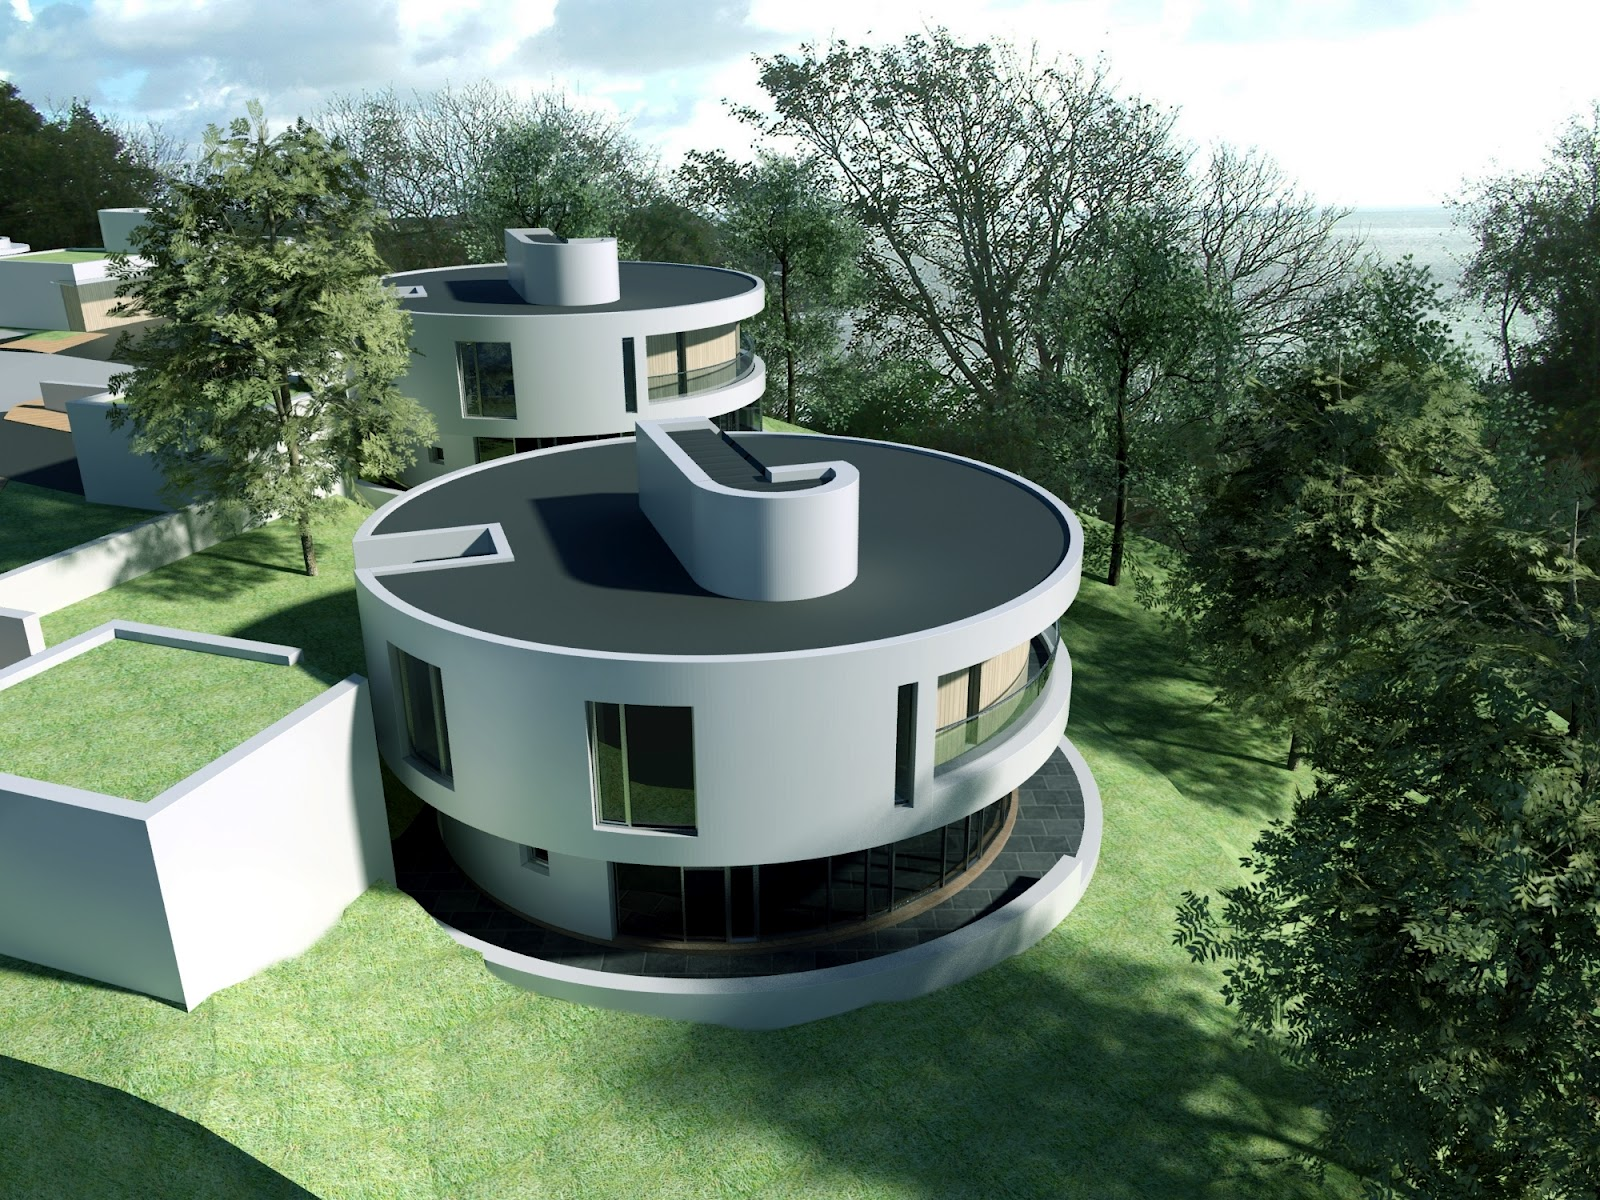 New home designs latest.: Modern unique homes designs.